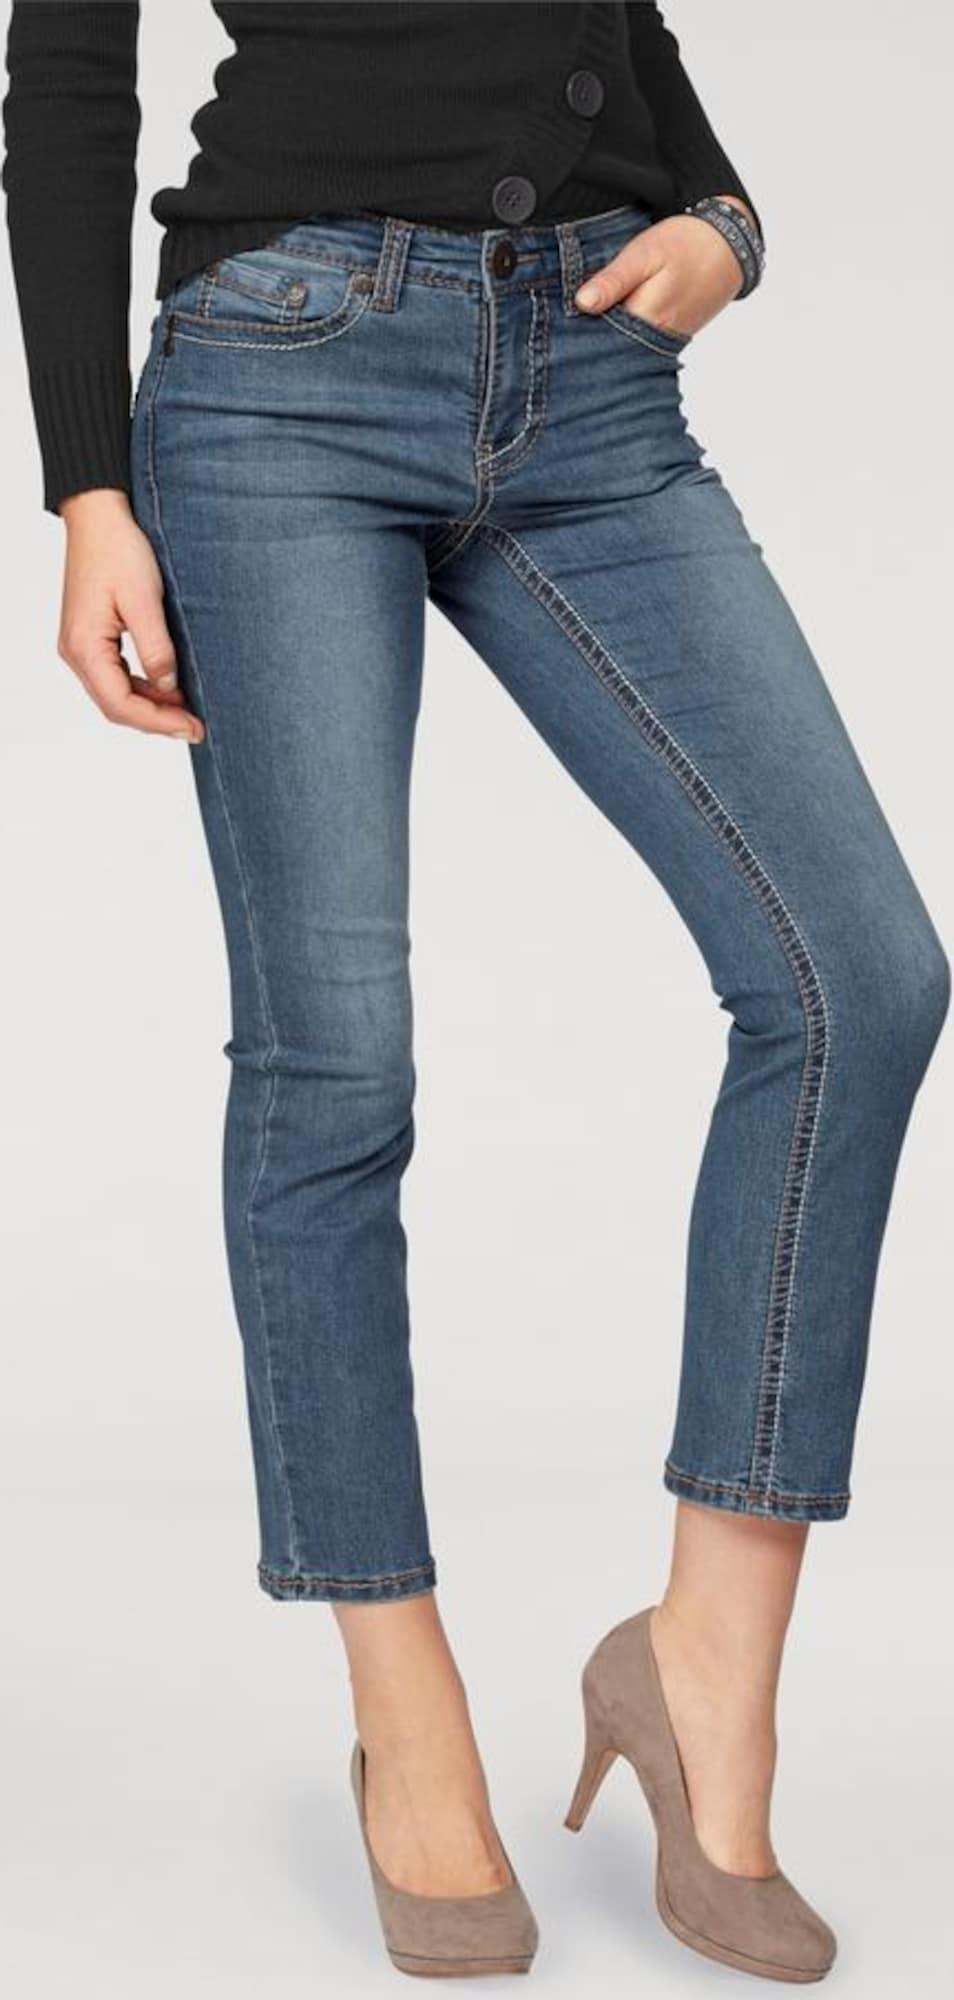 arizona jeans 39 mit kontrastn hten 39 in blauw about you. Black Bedroom Furniture Sets. Home Design Ideas